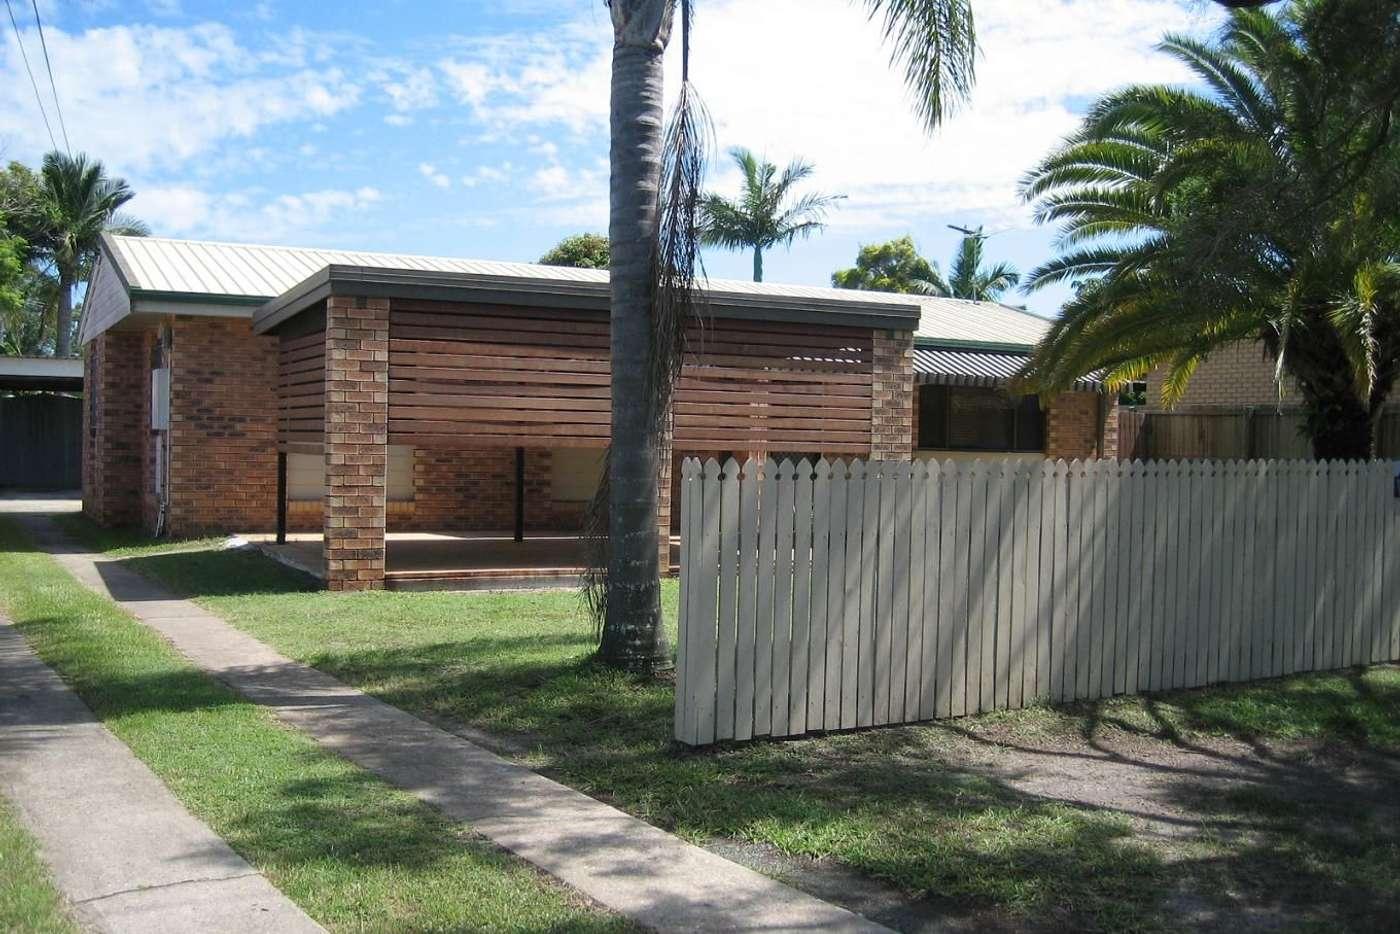 Main view of Homely house listing, 8 Chorley Street, Kippa-ring QLD 4021